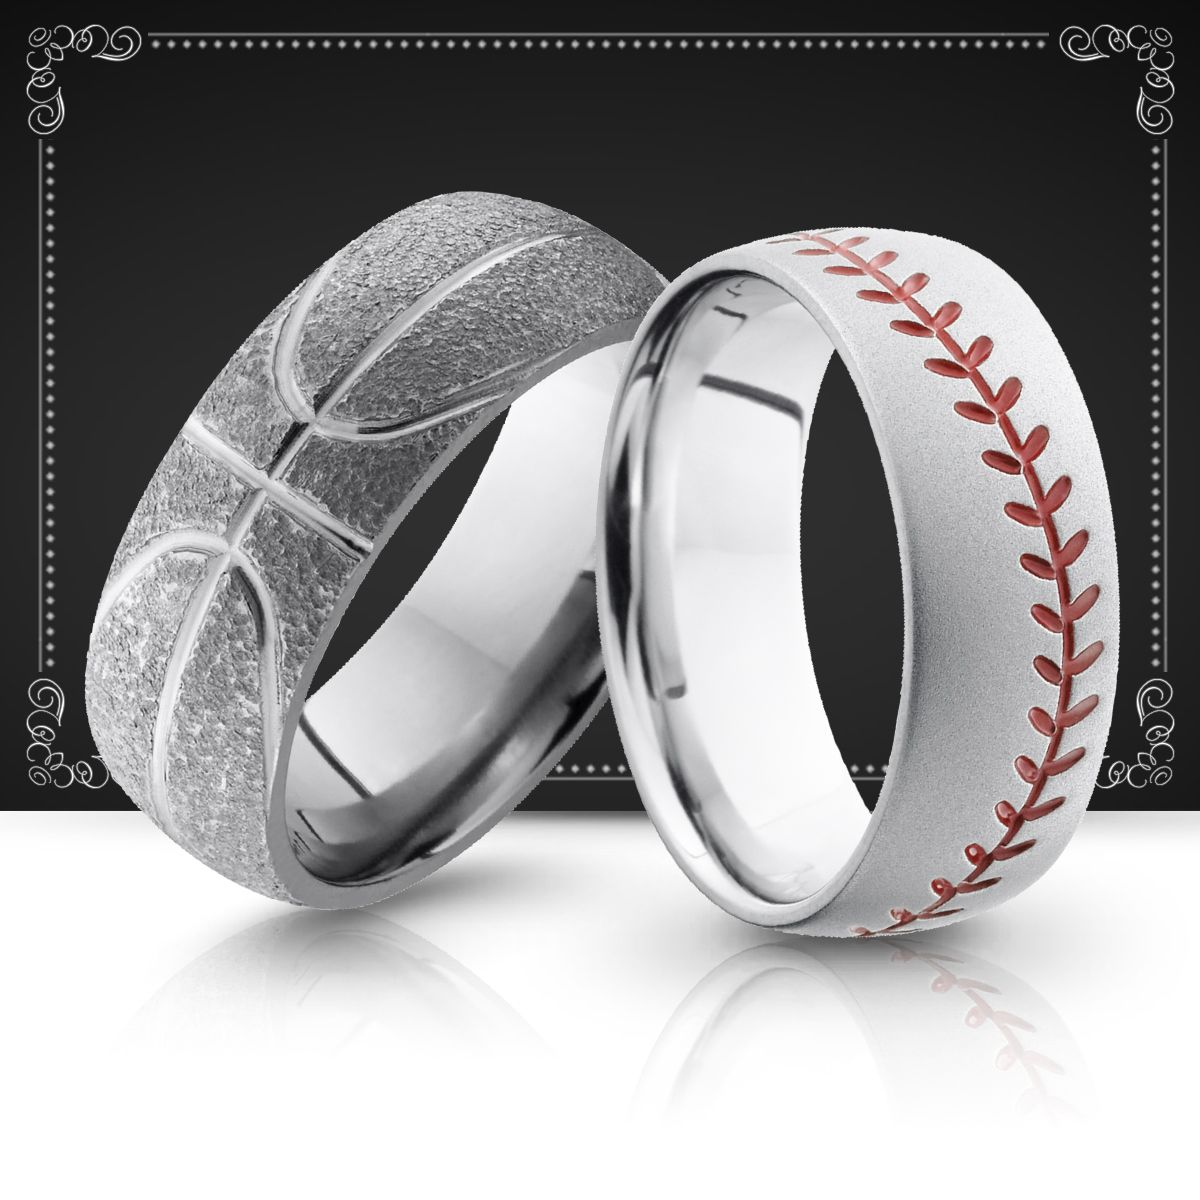 sports mens wedding bands wedding rings baseball basketball - Sports Wedding Rings